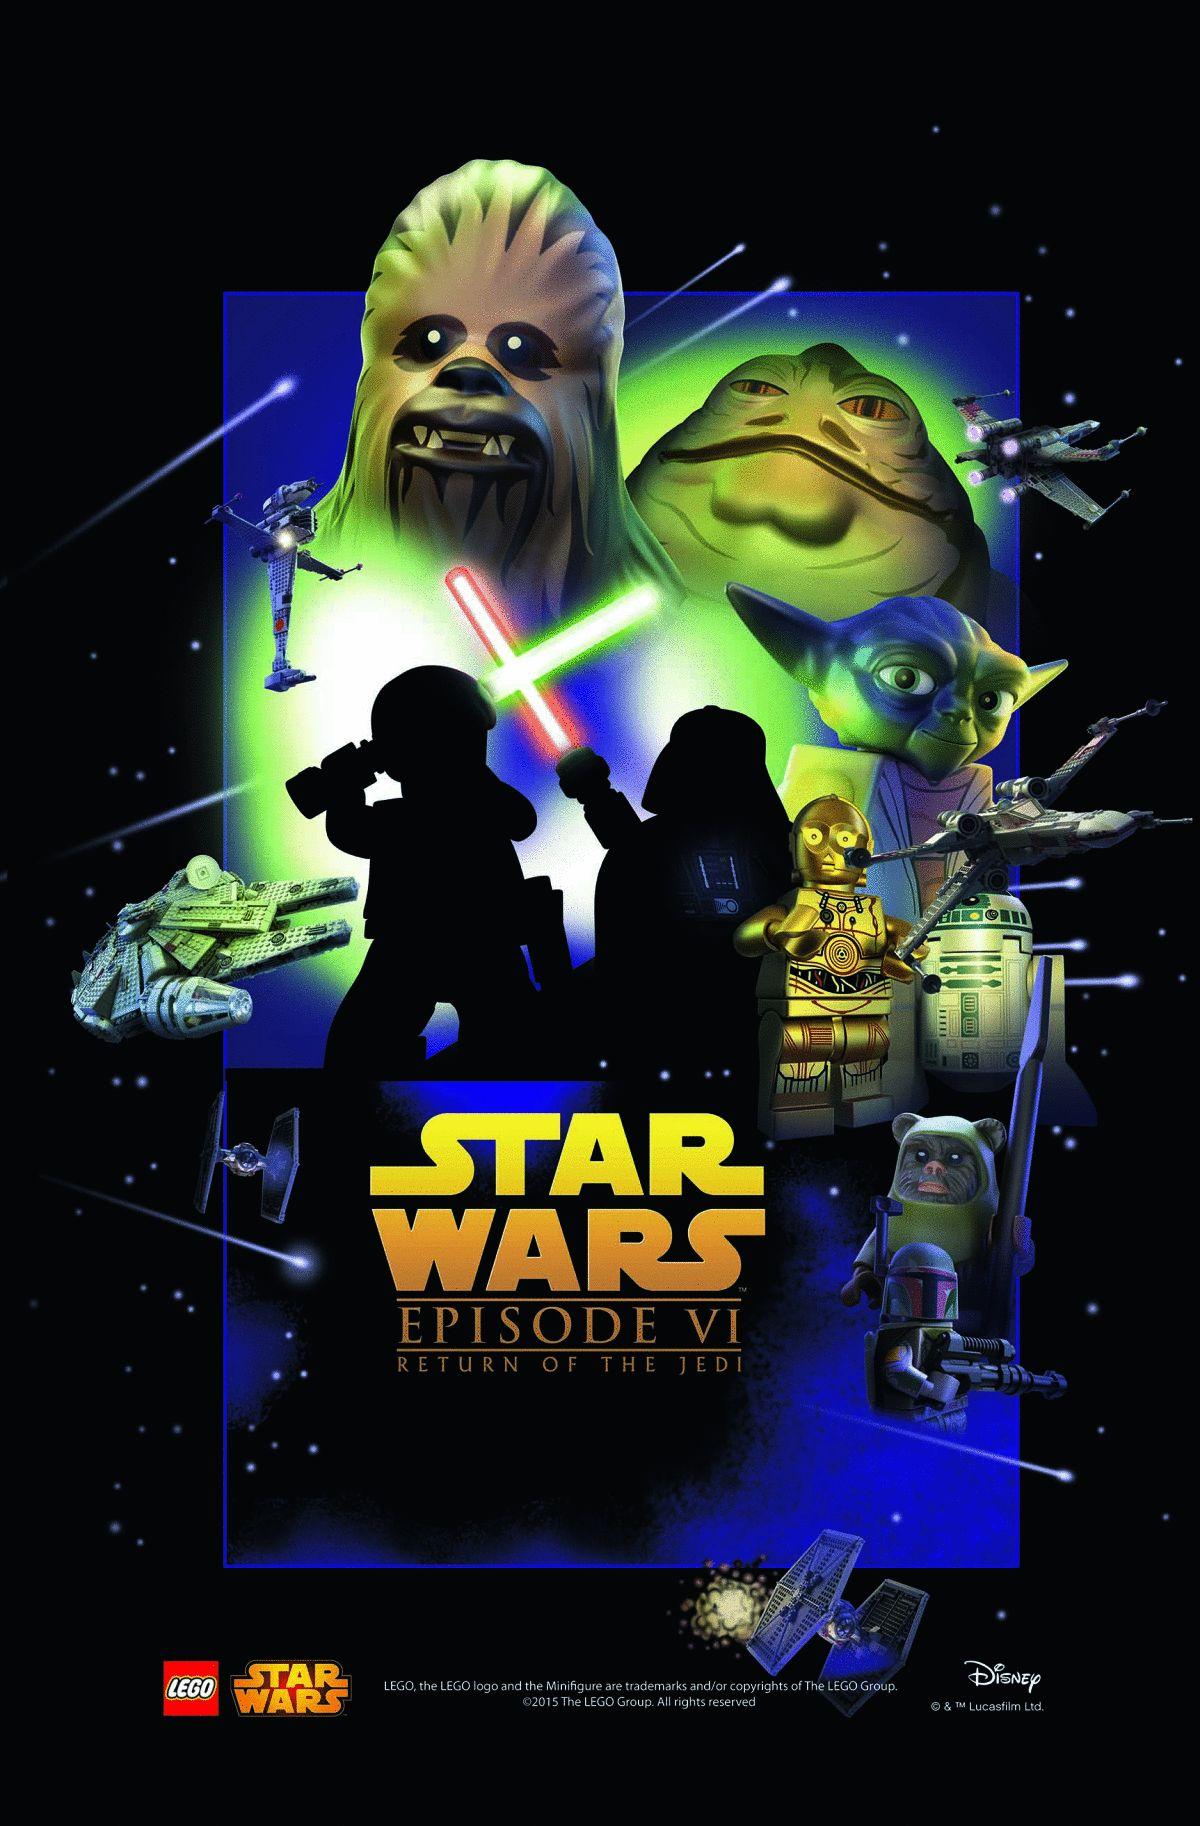 see drew struzan's lego star wars posters